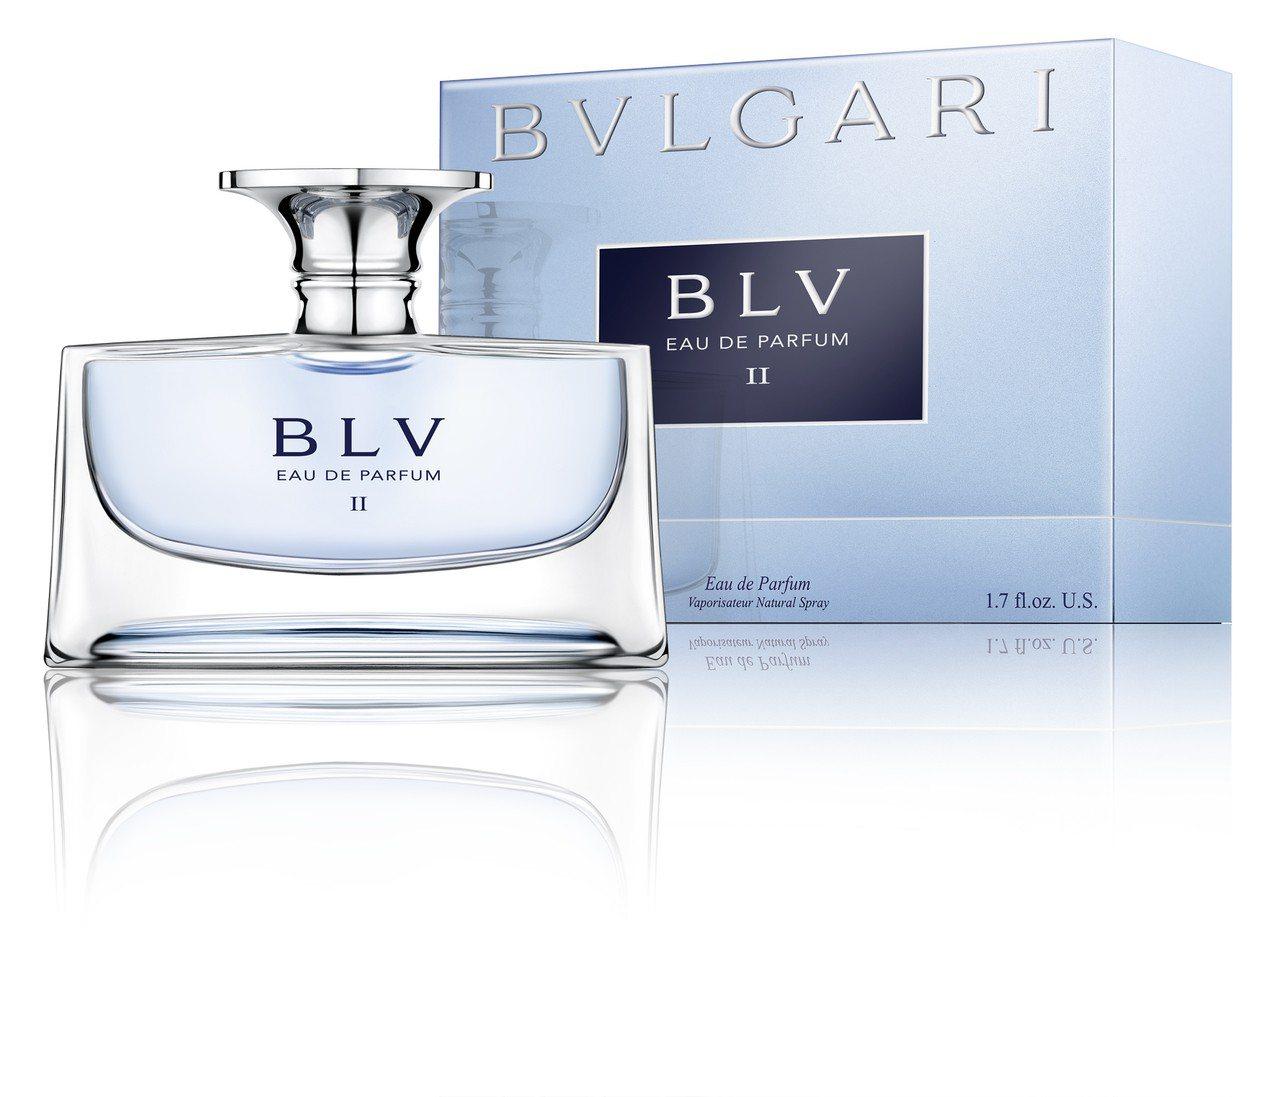 BVLGARI寶格麗BLV Eau de Parfum II沁藍女性淡香精,已停...